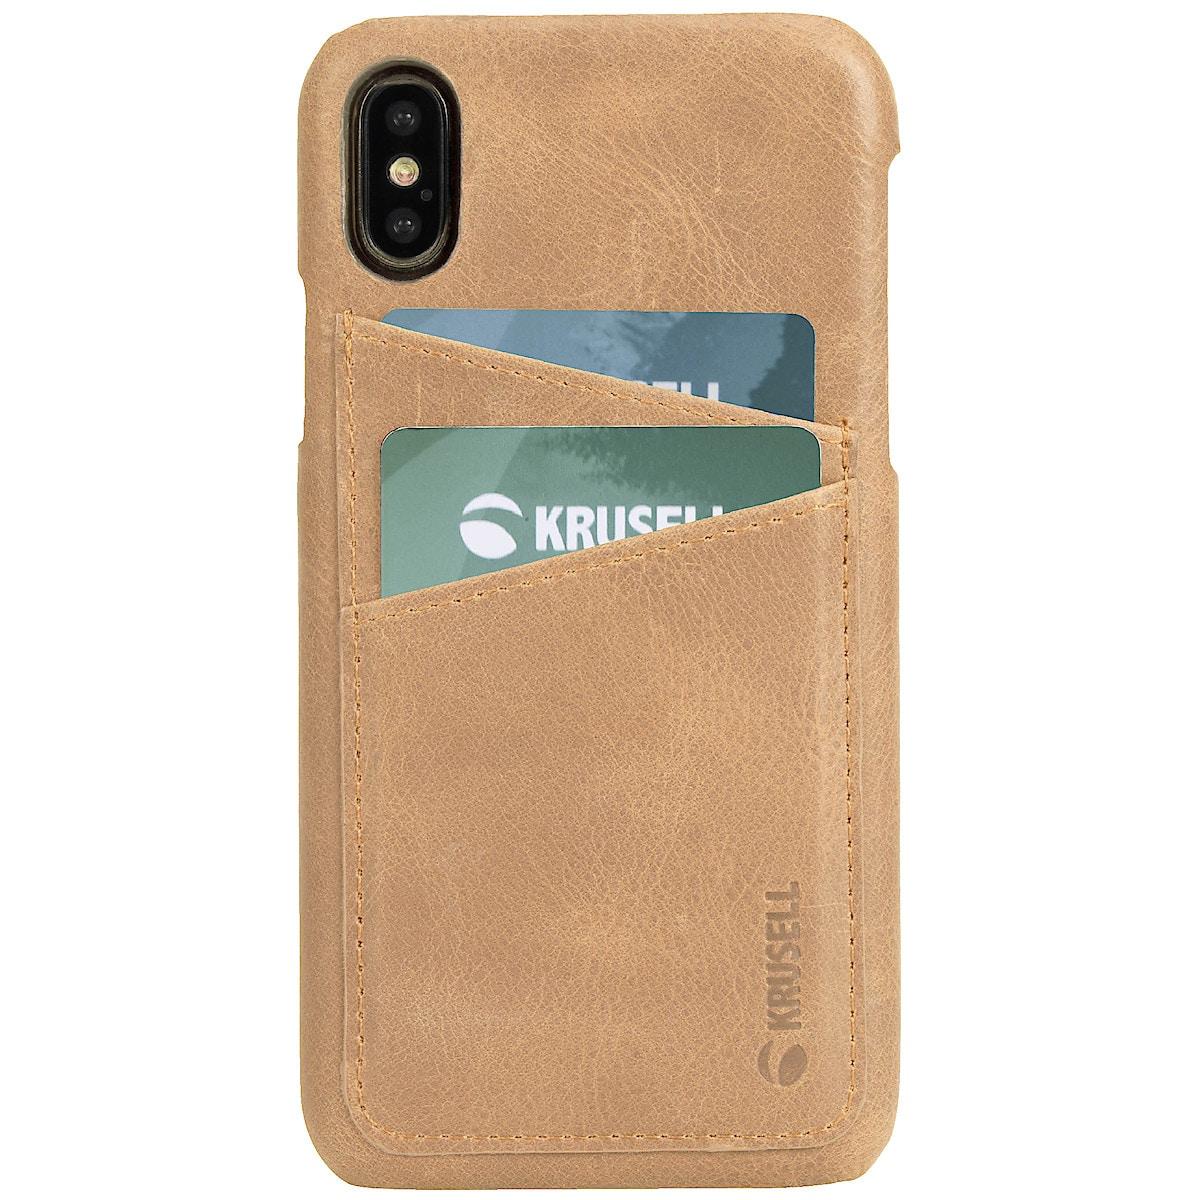 Plånboksfodral för iPhone X/XS Krusell Sunne